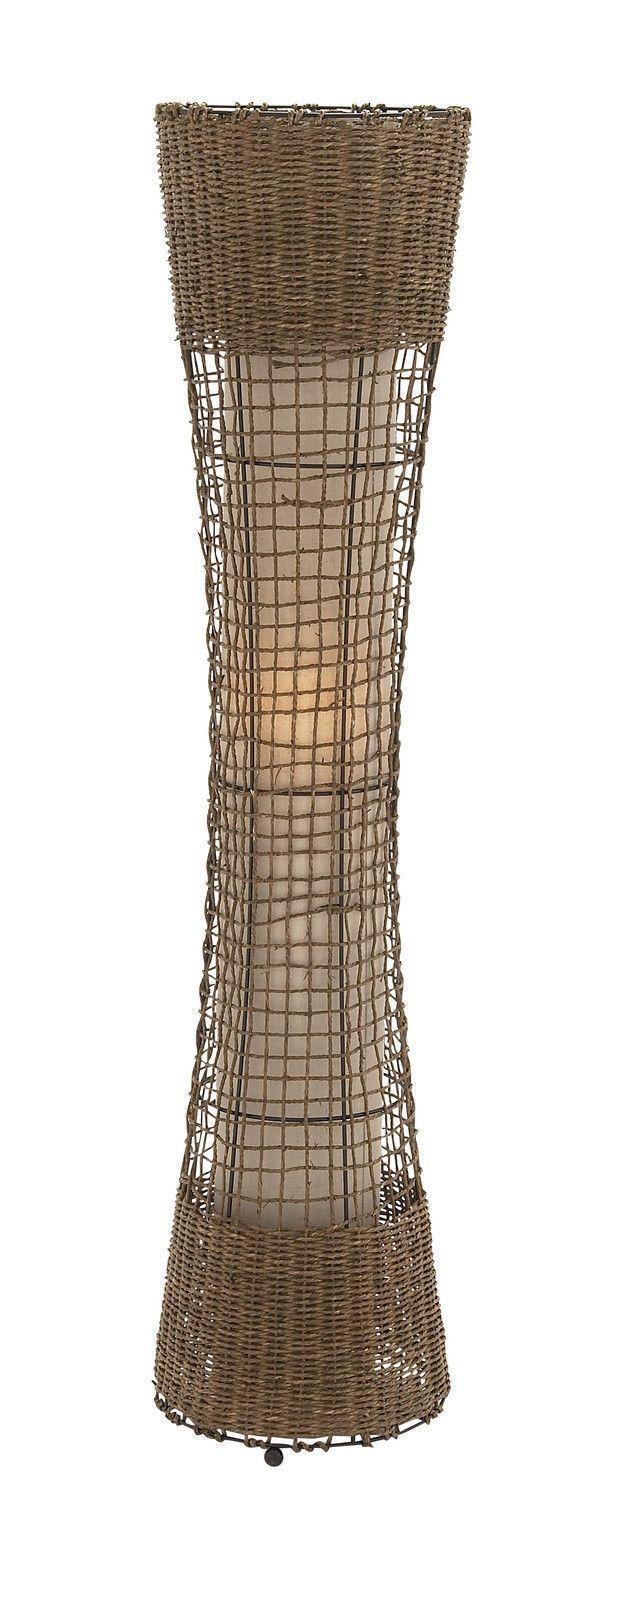 "Modern 48"" Tall Standing Metal Woven Rattan Floor Lamp Contemporary Natural"